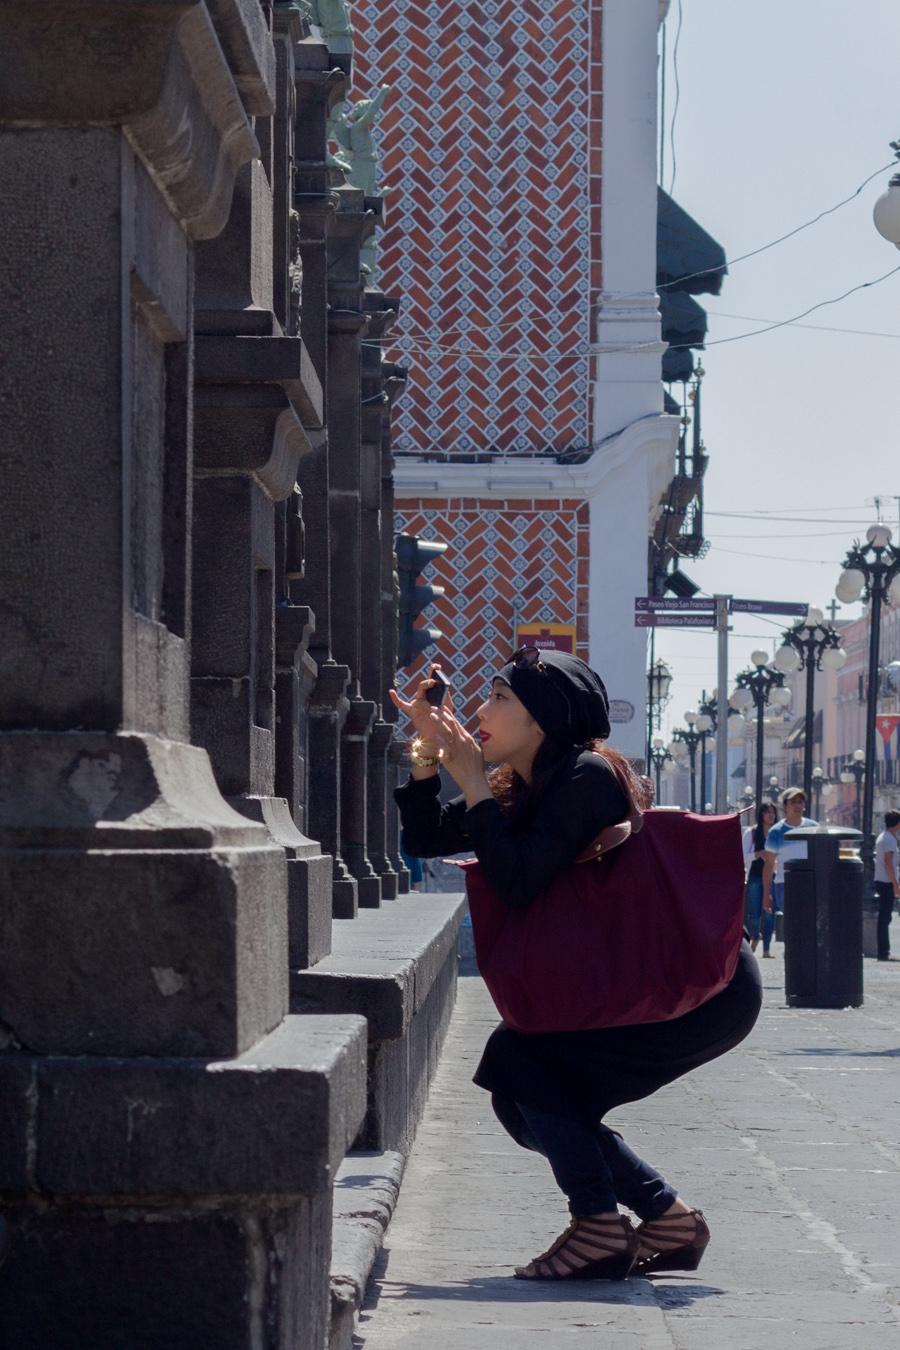 street_portrait-iamleoo-blog-puebla-moda-mexico.jpg